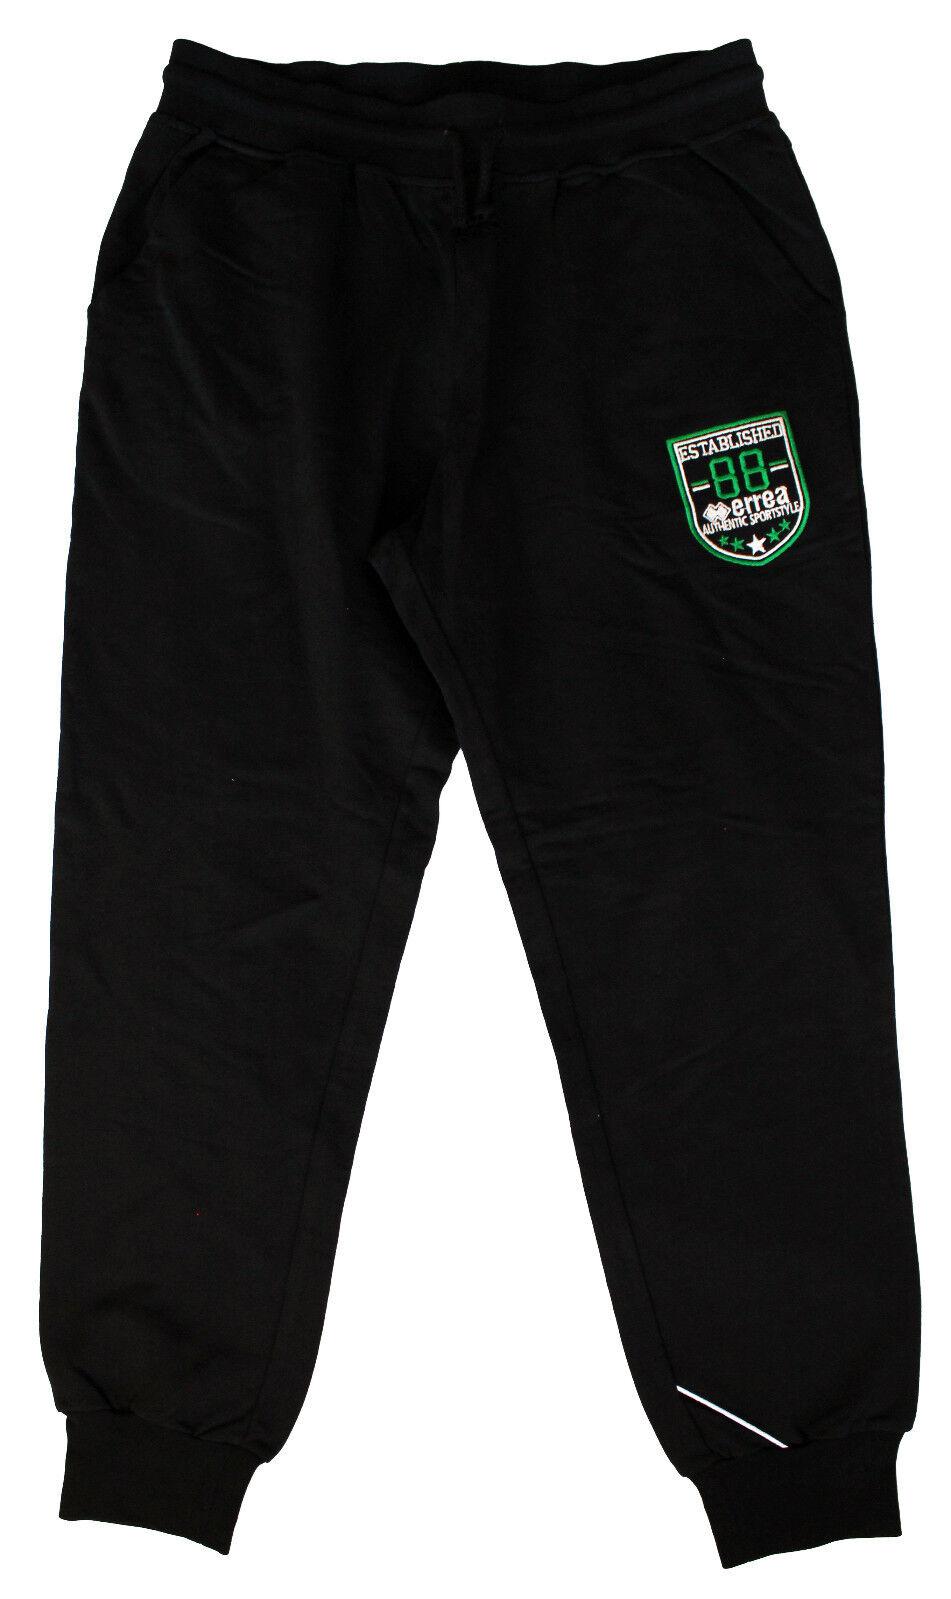 ERREA REPUBLIC Chet nero long pants uomo pantaloni lunghi neri uomo cod. EY785